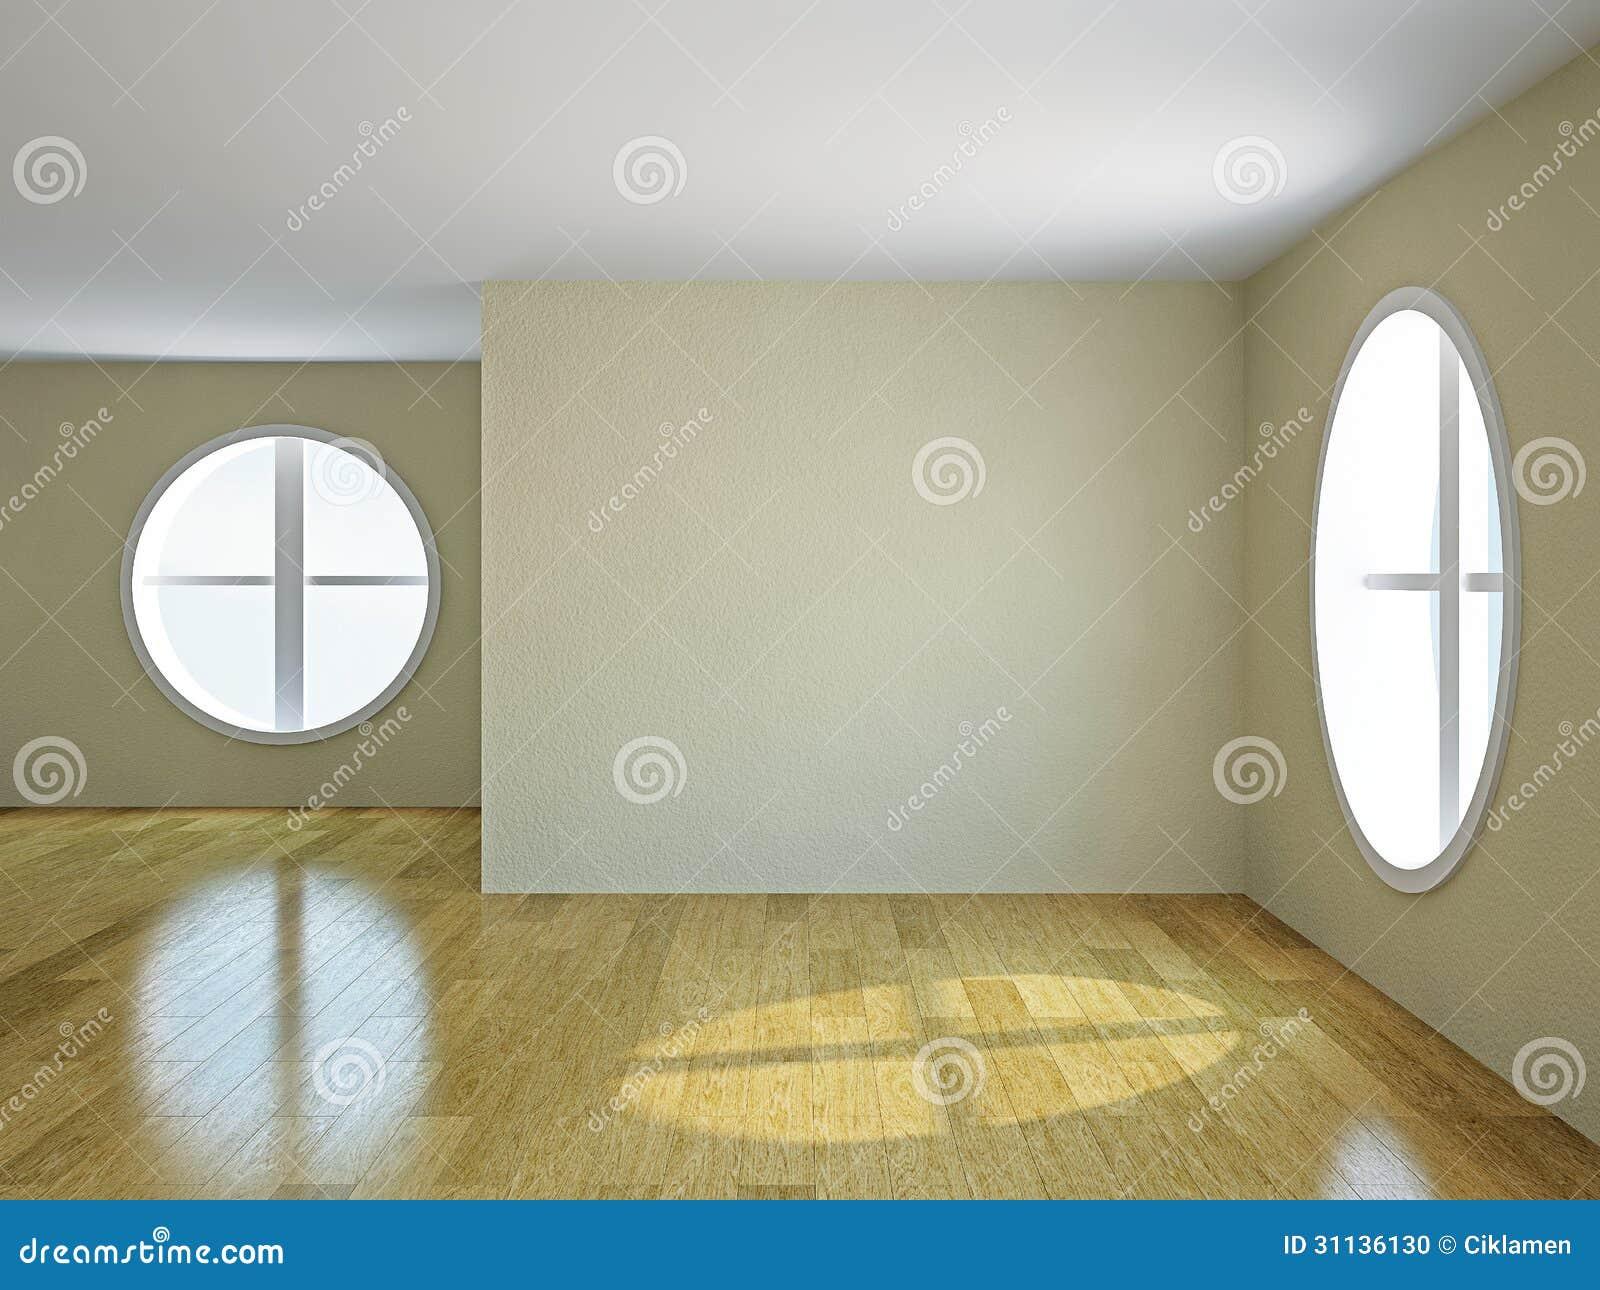 leerer raum mit fenstern stockfoto bild 31136130. Black Bedroom Furniture Sets. Home Design Ideas